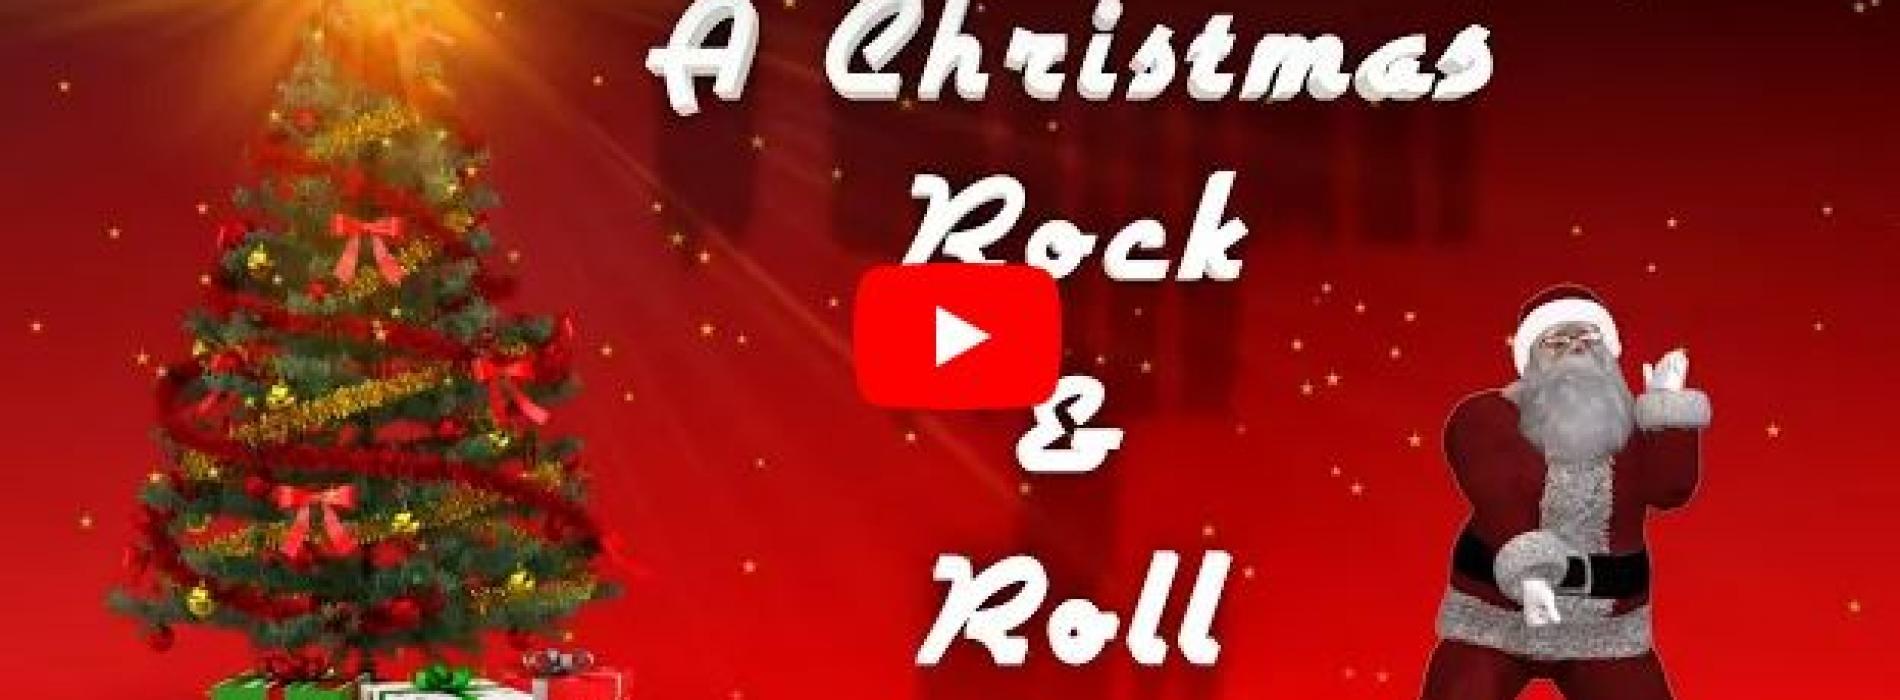 New Music : A Christmas Rock & Roll (Cover) – Voice Print Academy | Junior Choir